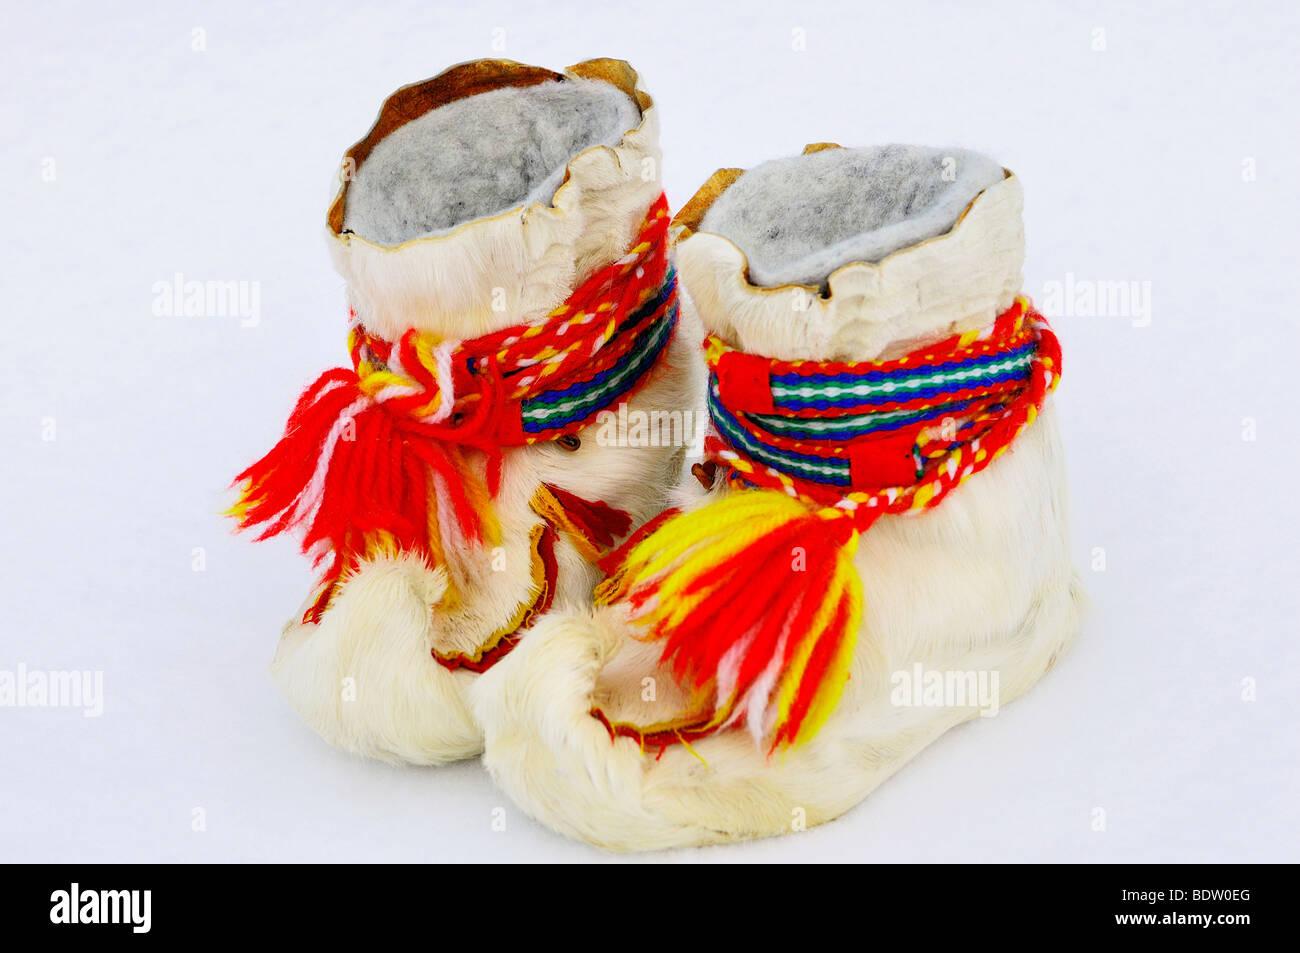 Samische winterschuhe, lappland, SCHWEDEN, sami scarpe invernali, Lapponia, Svezia Immagini Stock